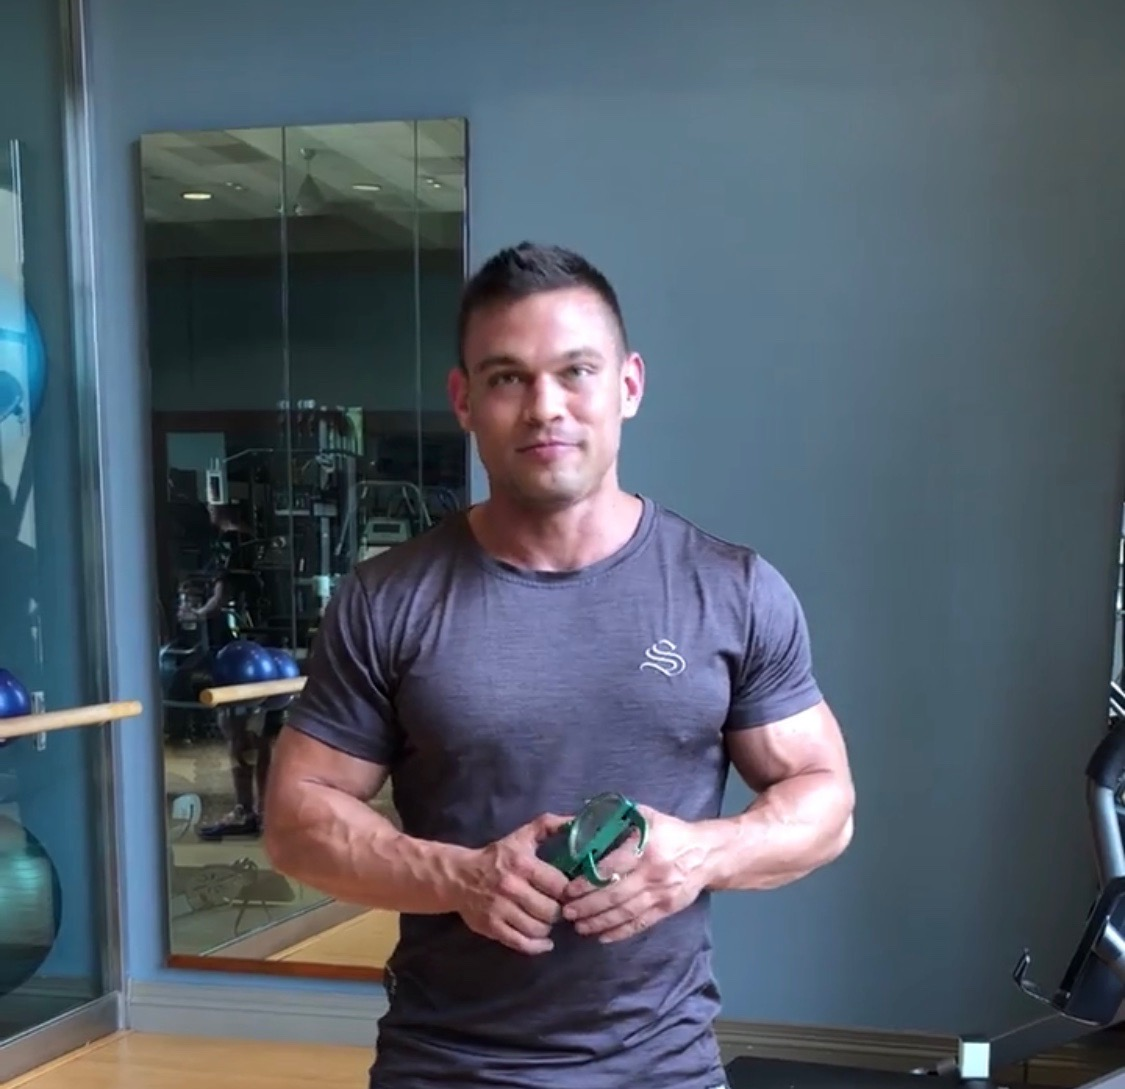 JONATHAN WARREN - Bodybuilder. Trainer. Neuromuscular Therapist.